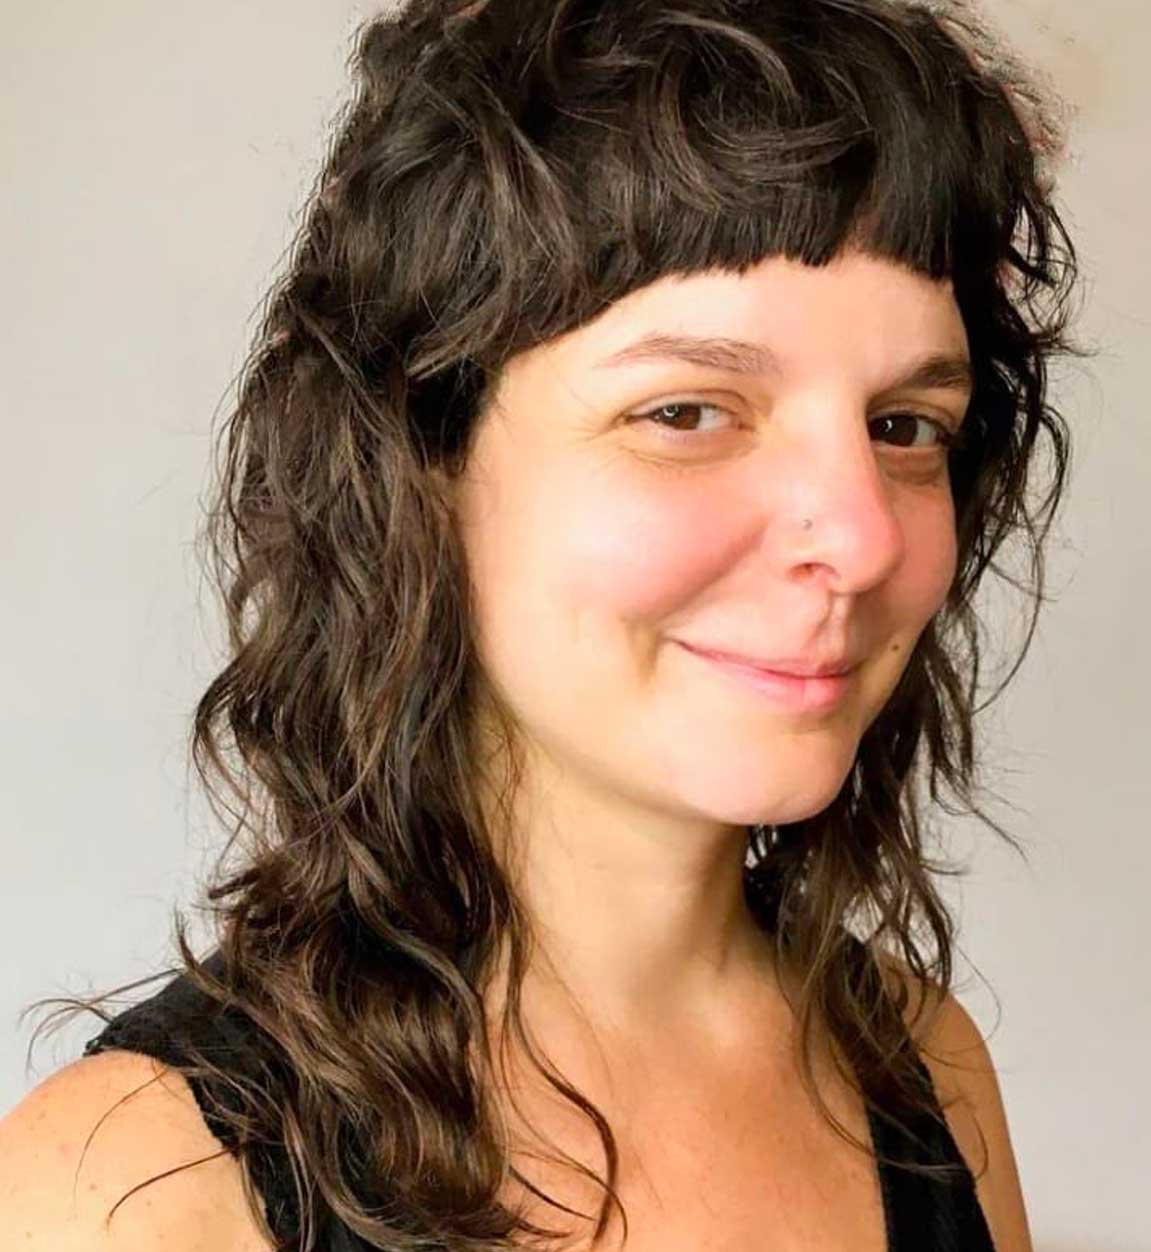 Lic. Brenda Estébanez